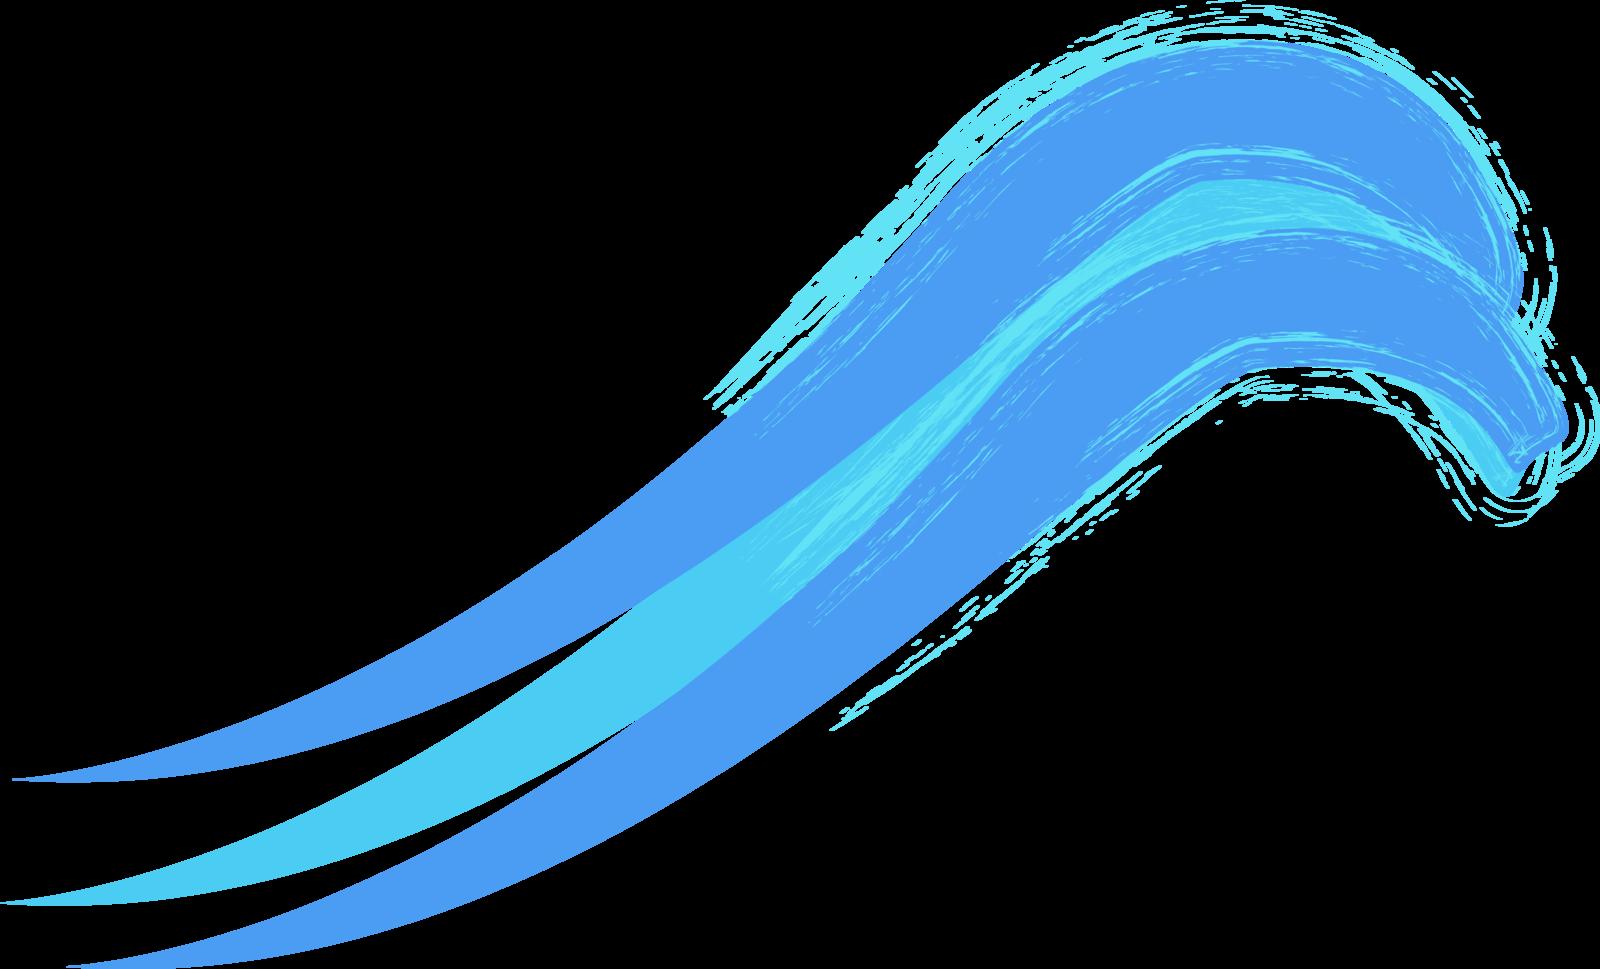 Tsunami Wave PNG - 81572